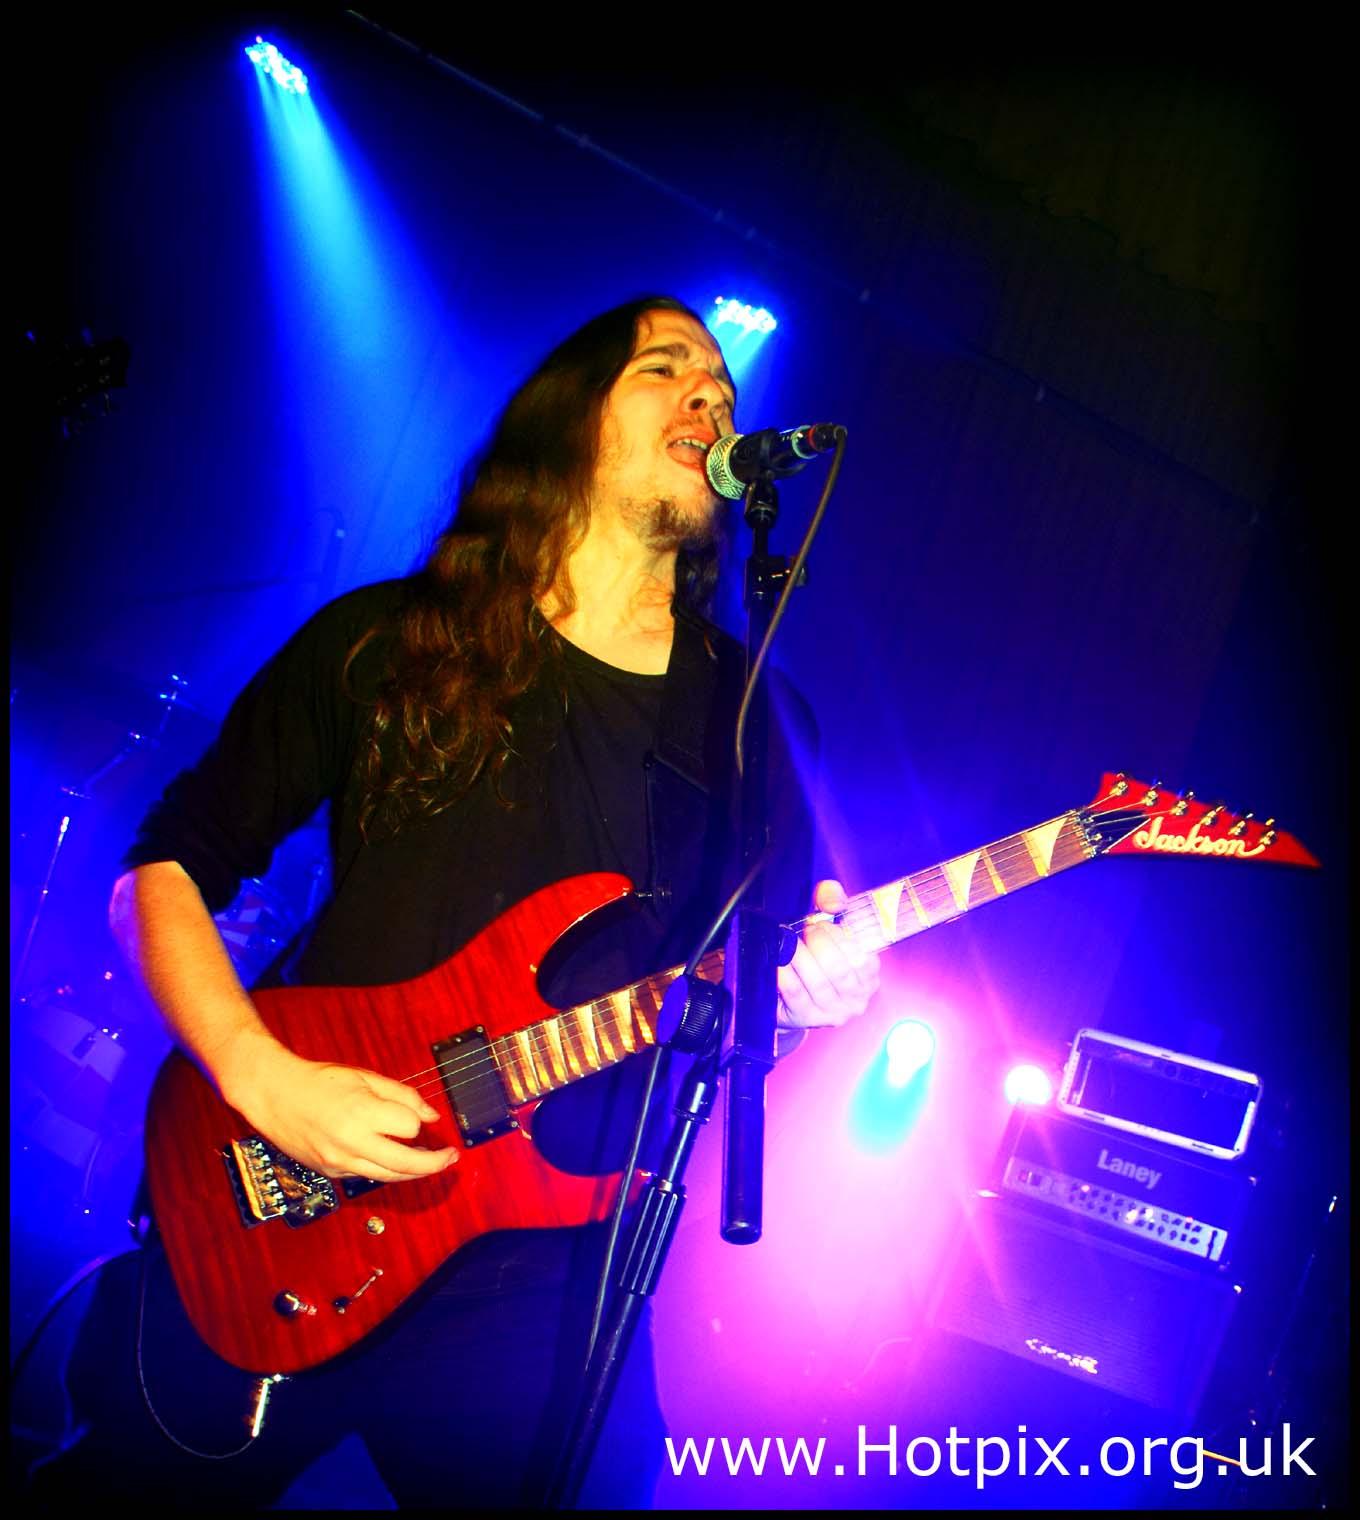 band,bands,cheshire,live,stage,gig,concert,rock,rocker,guitar,guitarist,light,lighting,tony,smith,tonysmith,hotpix,tonysmithhotpix,hot,pix,pics,picks,hotpicks,hotpics,spires,spire,rockers,manchester,MIS,@hotpixUK,ActiveH,housingtechnology